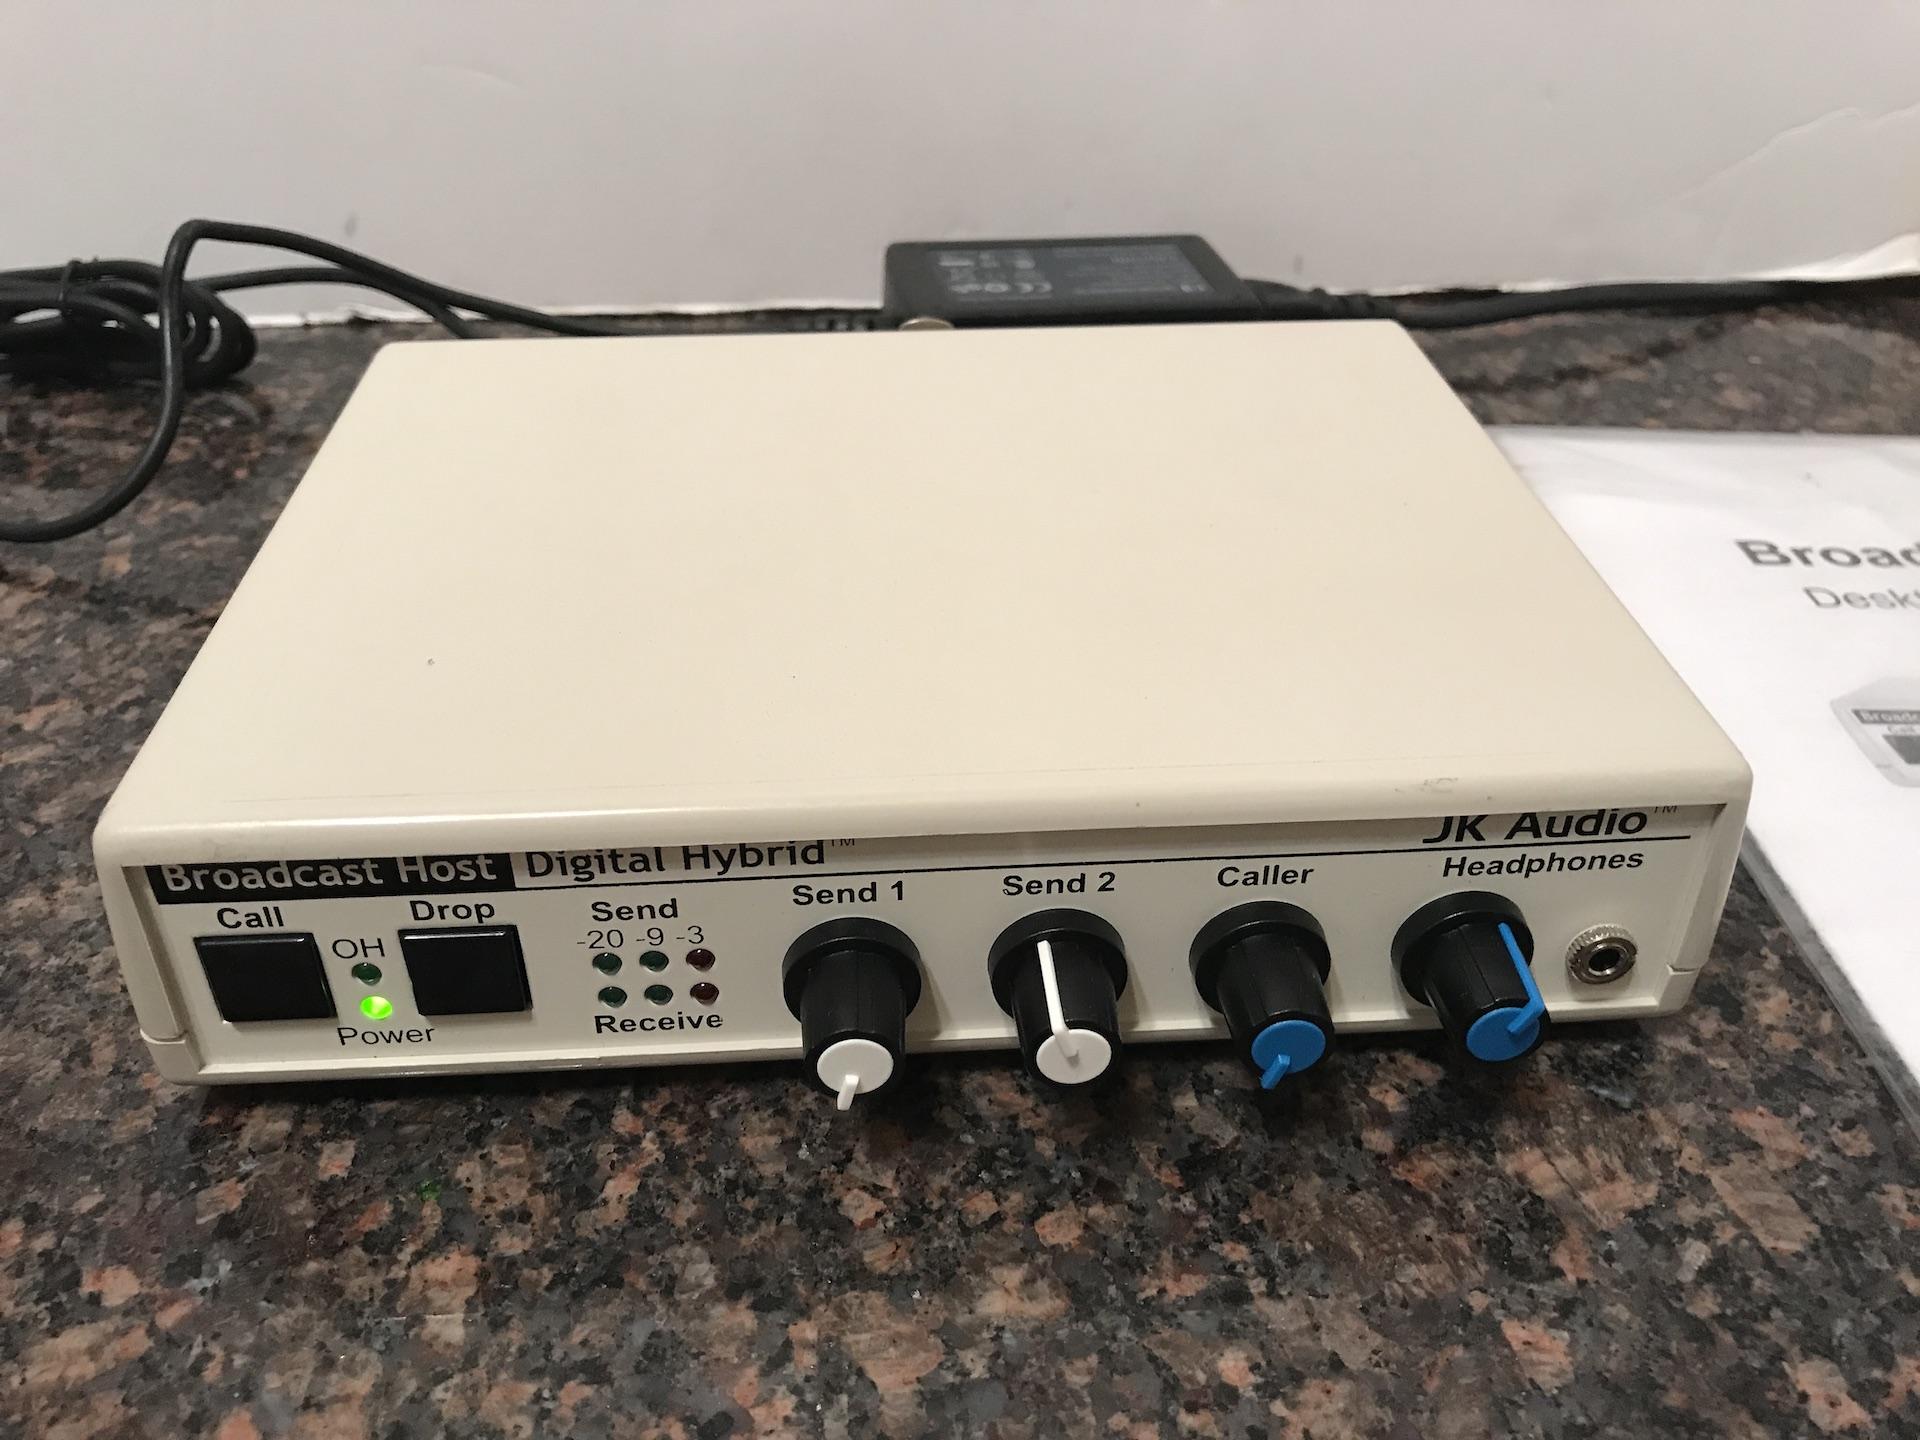 Broadcast Phone Systems :: JK Audio Broadcast Host Desktop Digital Hybrid - SKBroadcast. Broadcast equipment.